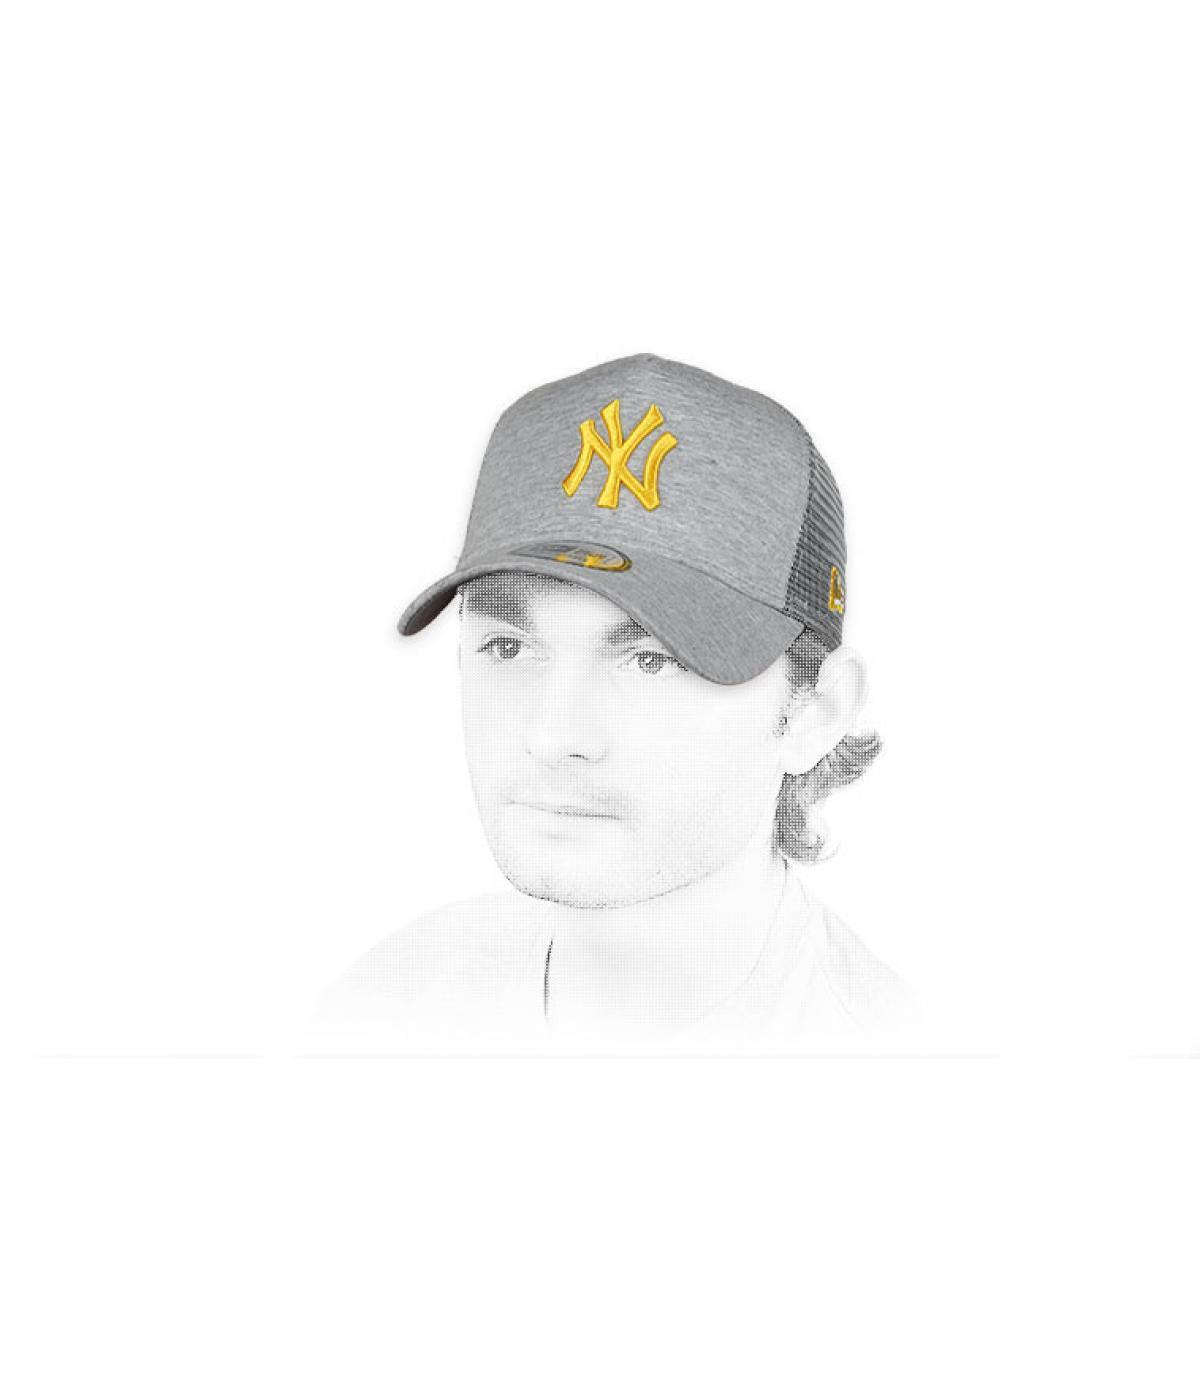 camionista NY grigio giallo